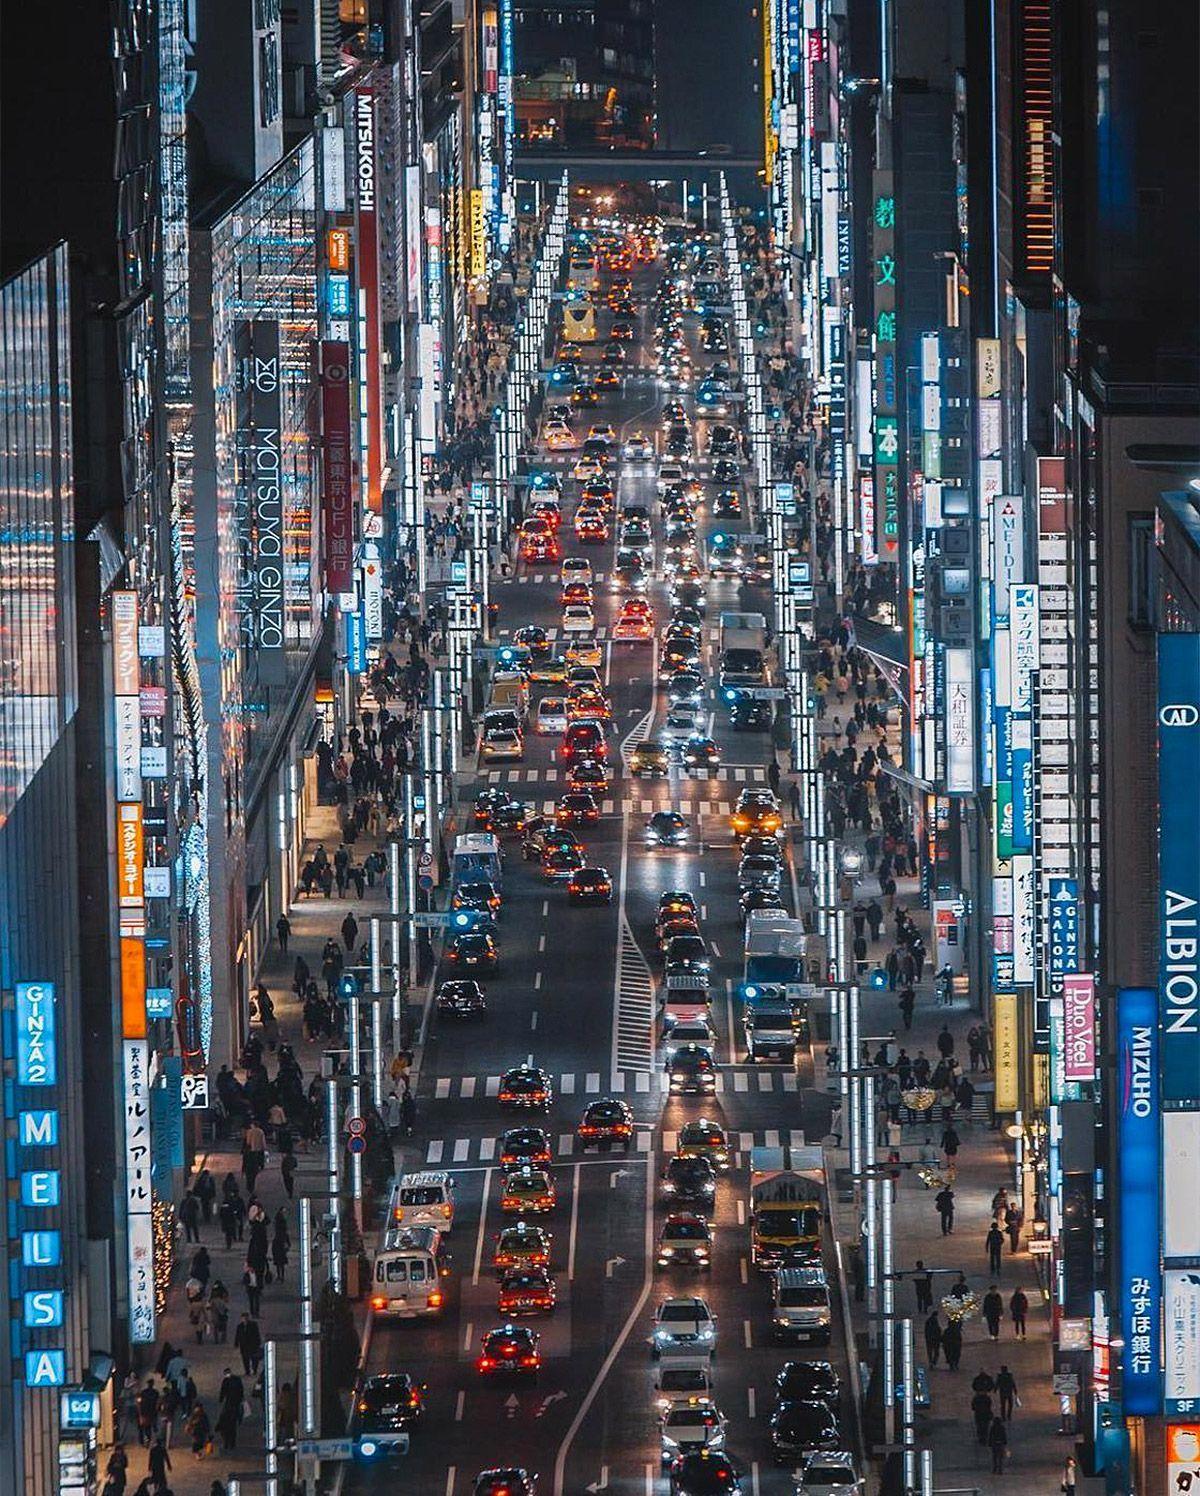 Tokyo Urban Photography Tokyo Urban Photography Tokyo Urban Photography Urban Landscape Photog In 2020 With Images Tokyo Photography Cityscape Photography Japan Photography